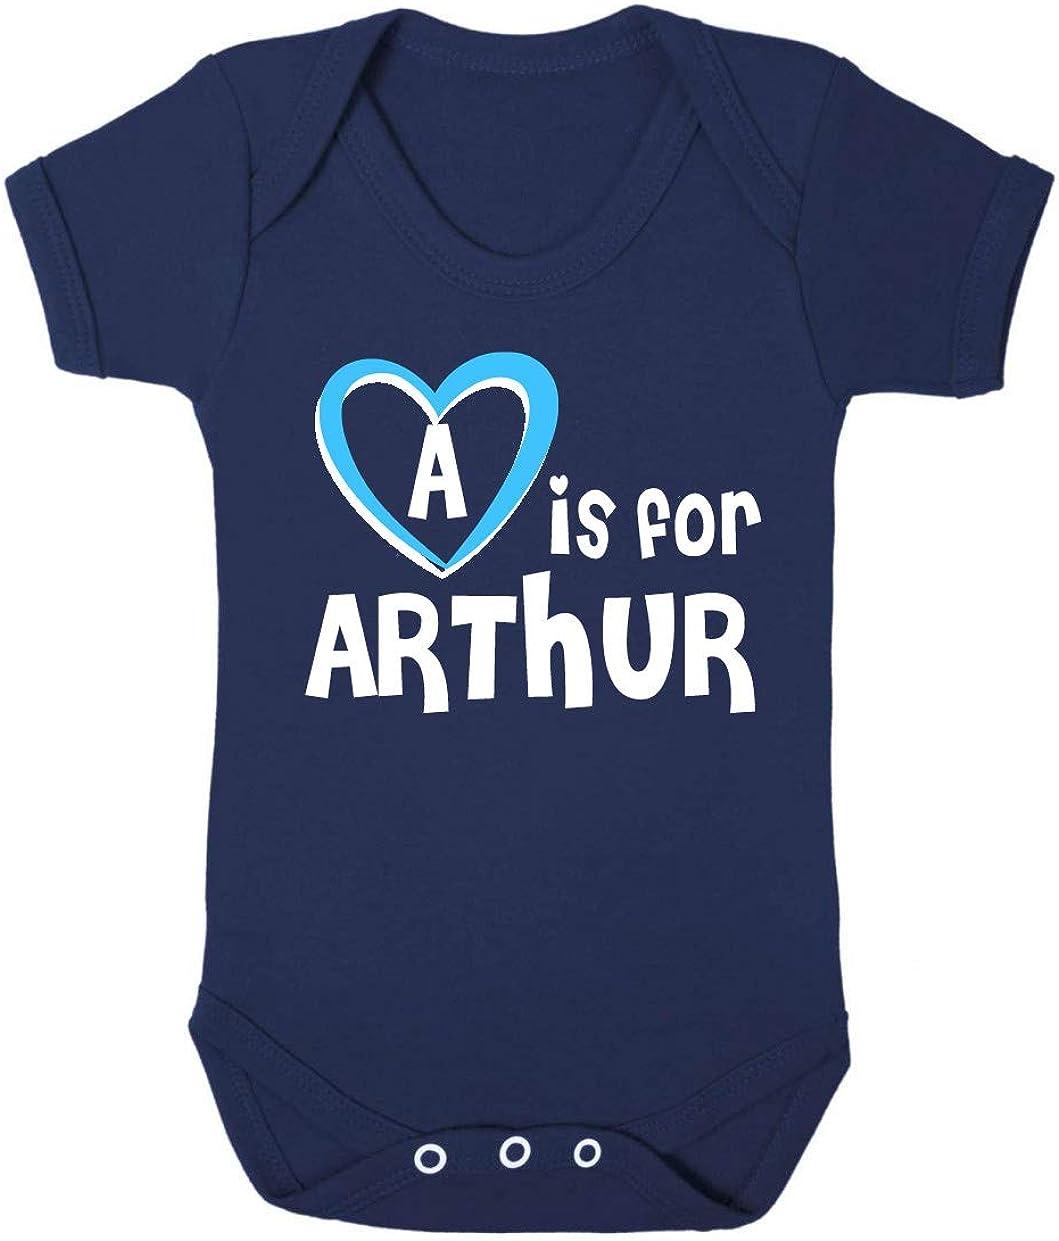 Baby Called Arthur Gift A is for Arthur Baby Bodysuit Arthur Baby Gift